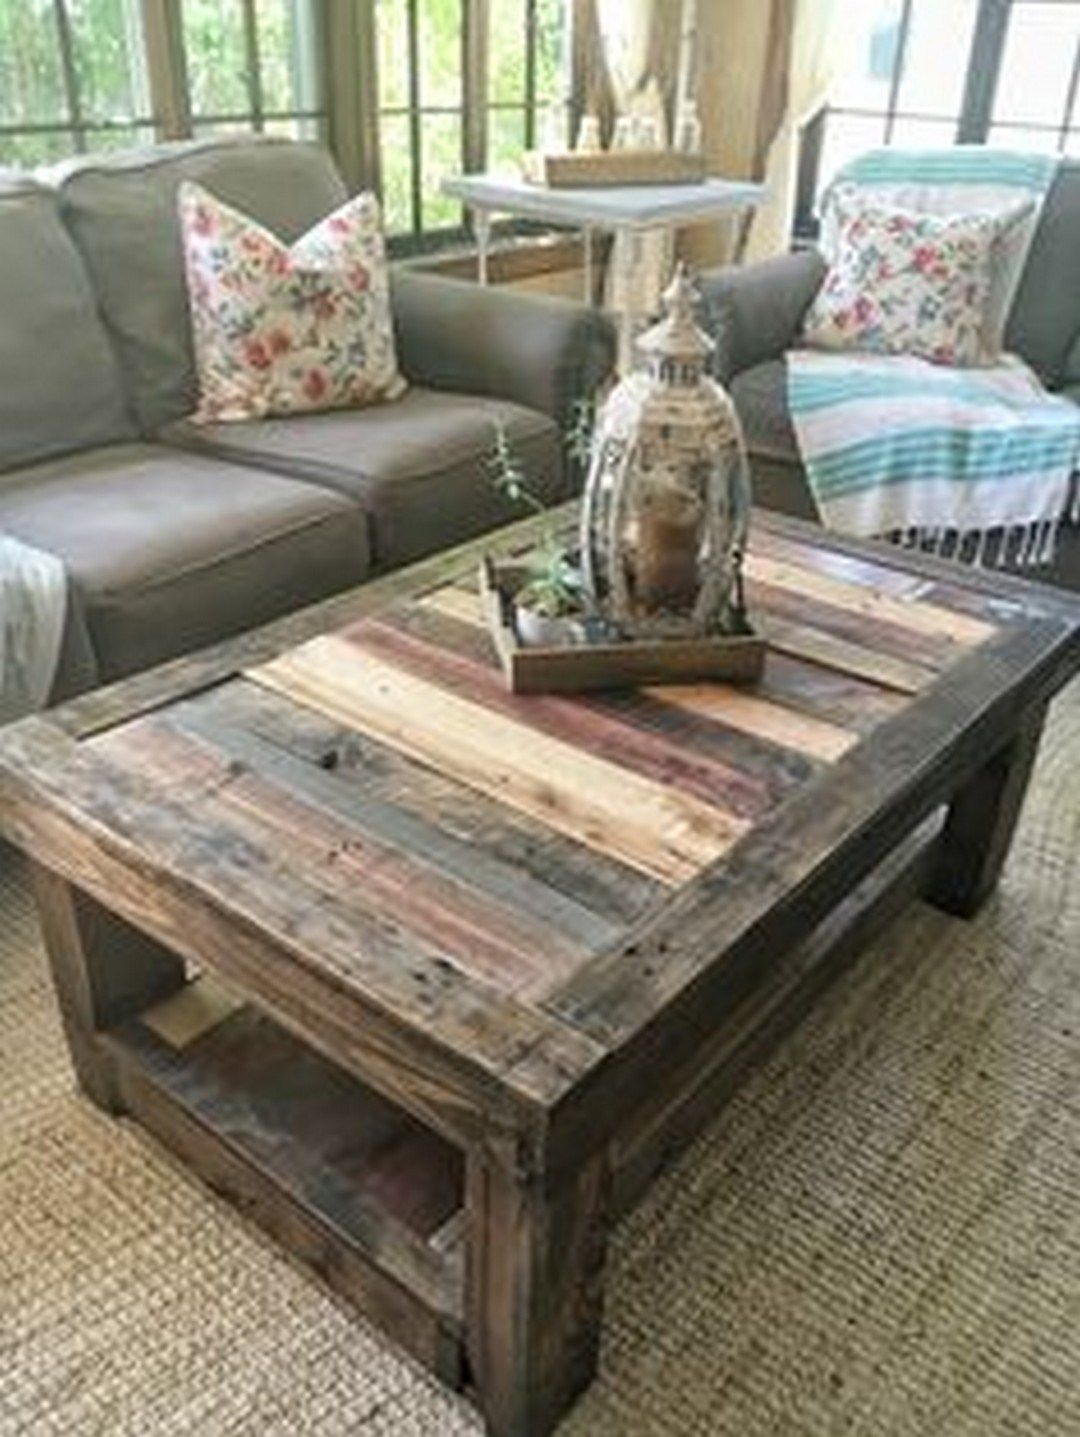 Awesome Diy Pallet Furniture Design Ideas 16 Decomagz Diy